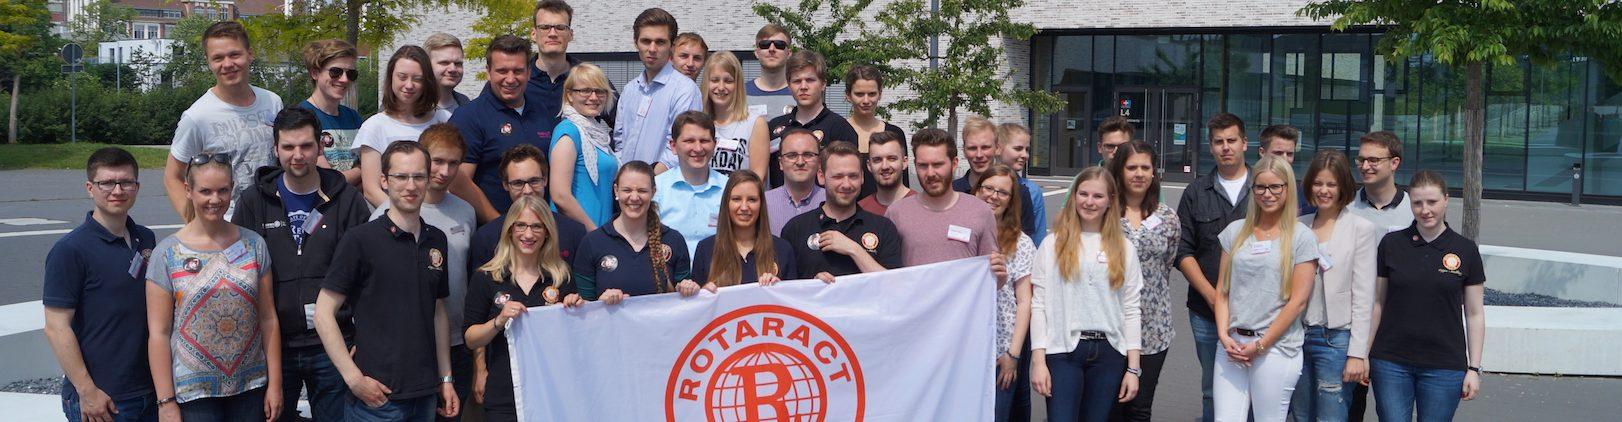 Rotaract Club Dortmund